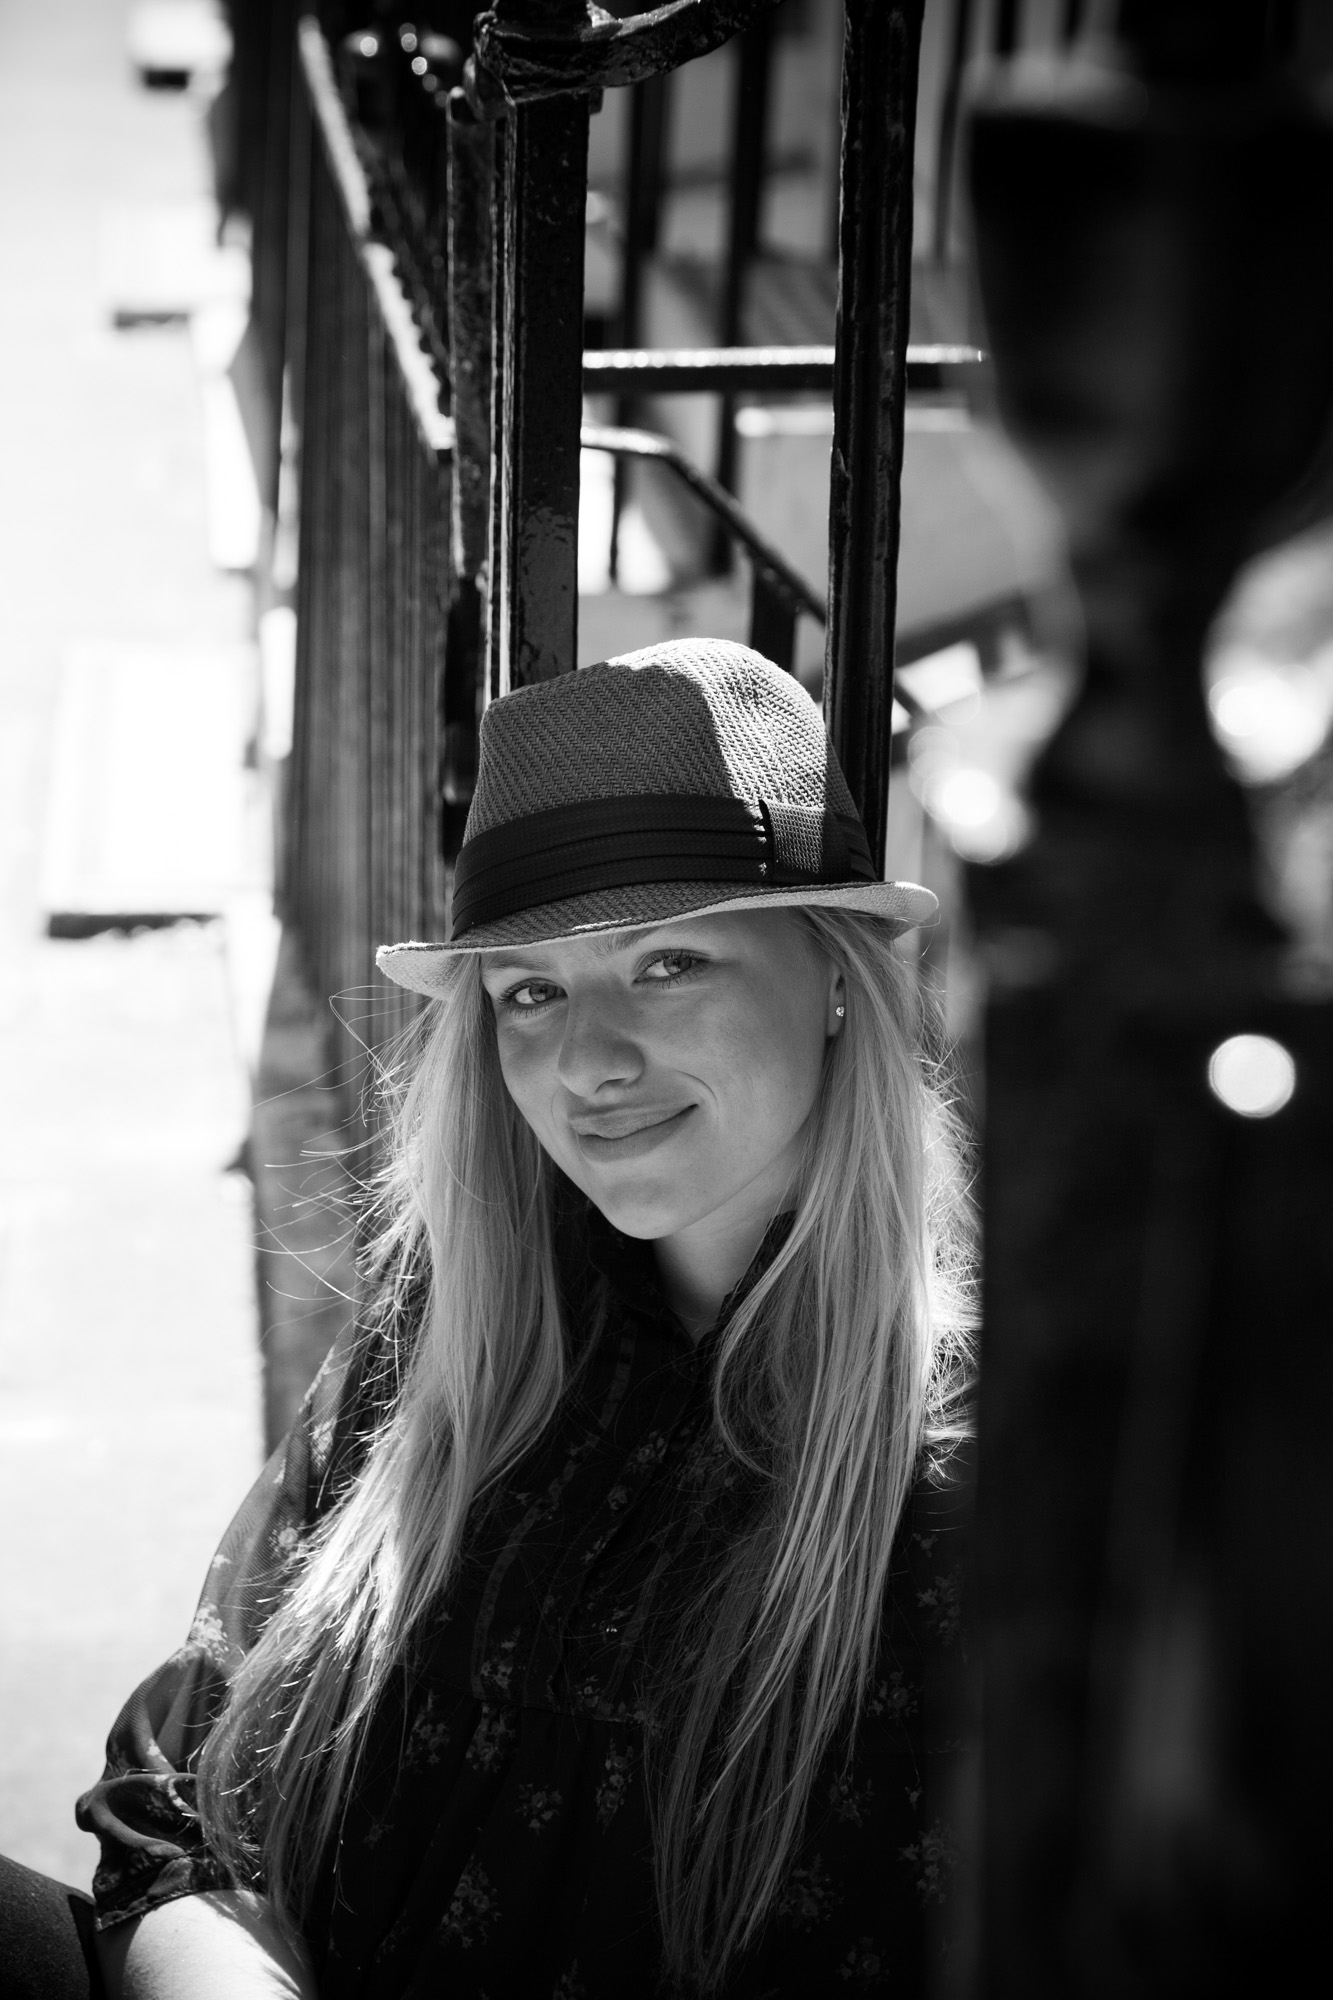 portraits-photographer-oxford-london-jonathan-self-photography_-38.jpg